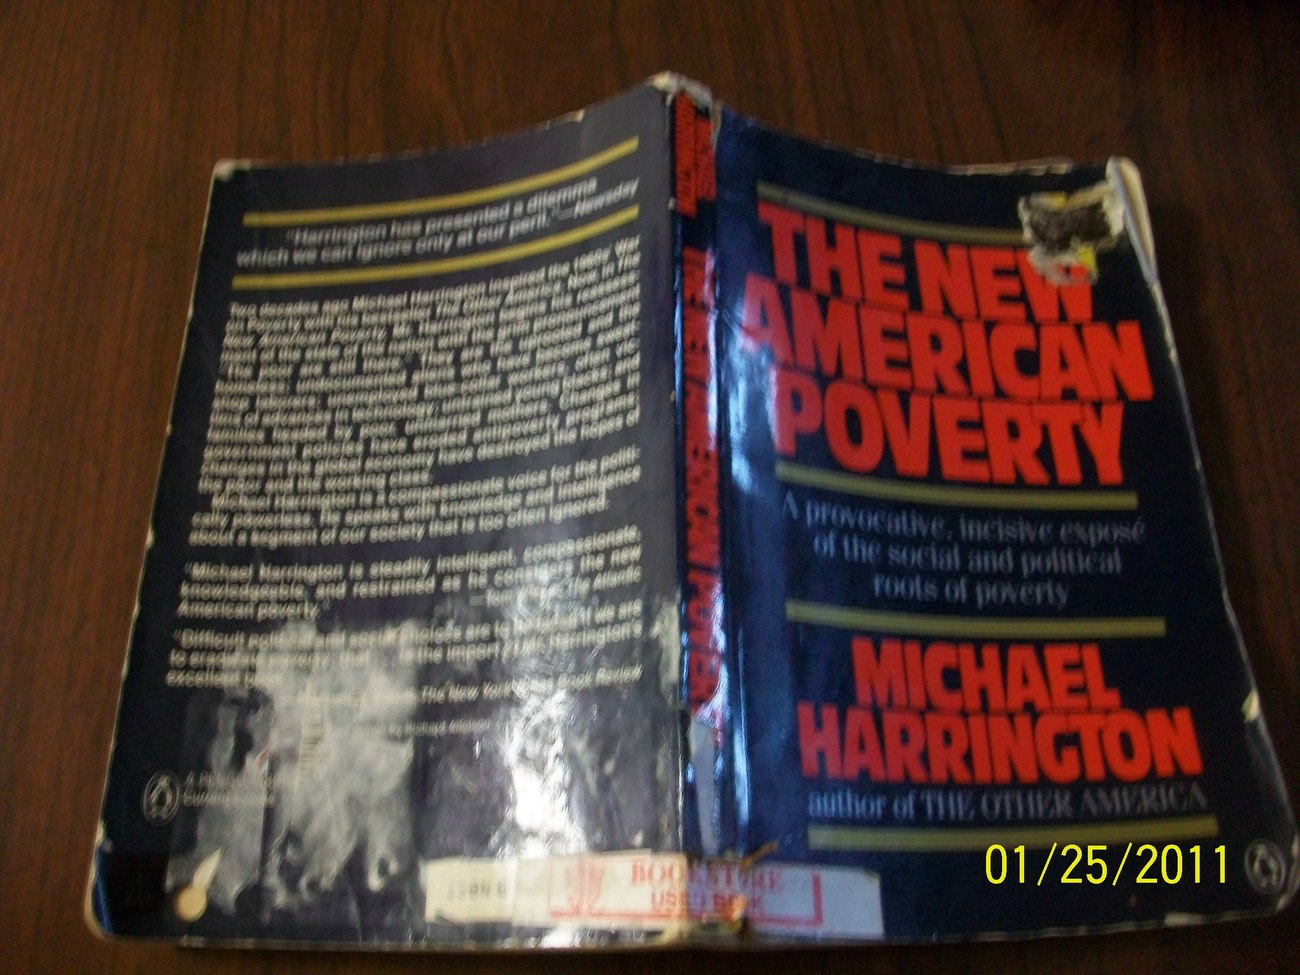 Michael Harrington, The new American Poverty, ISBN 0140081127